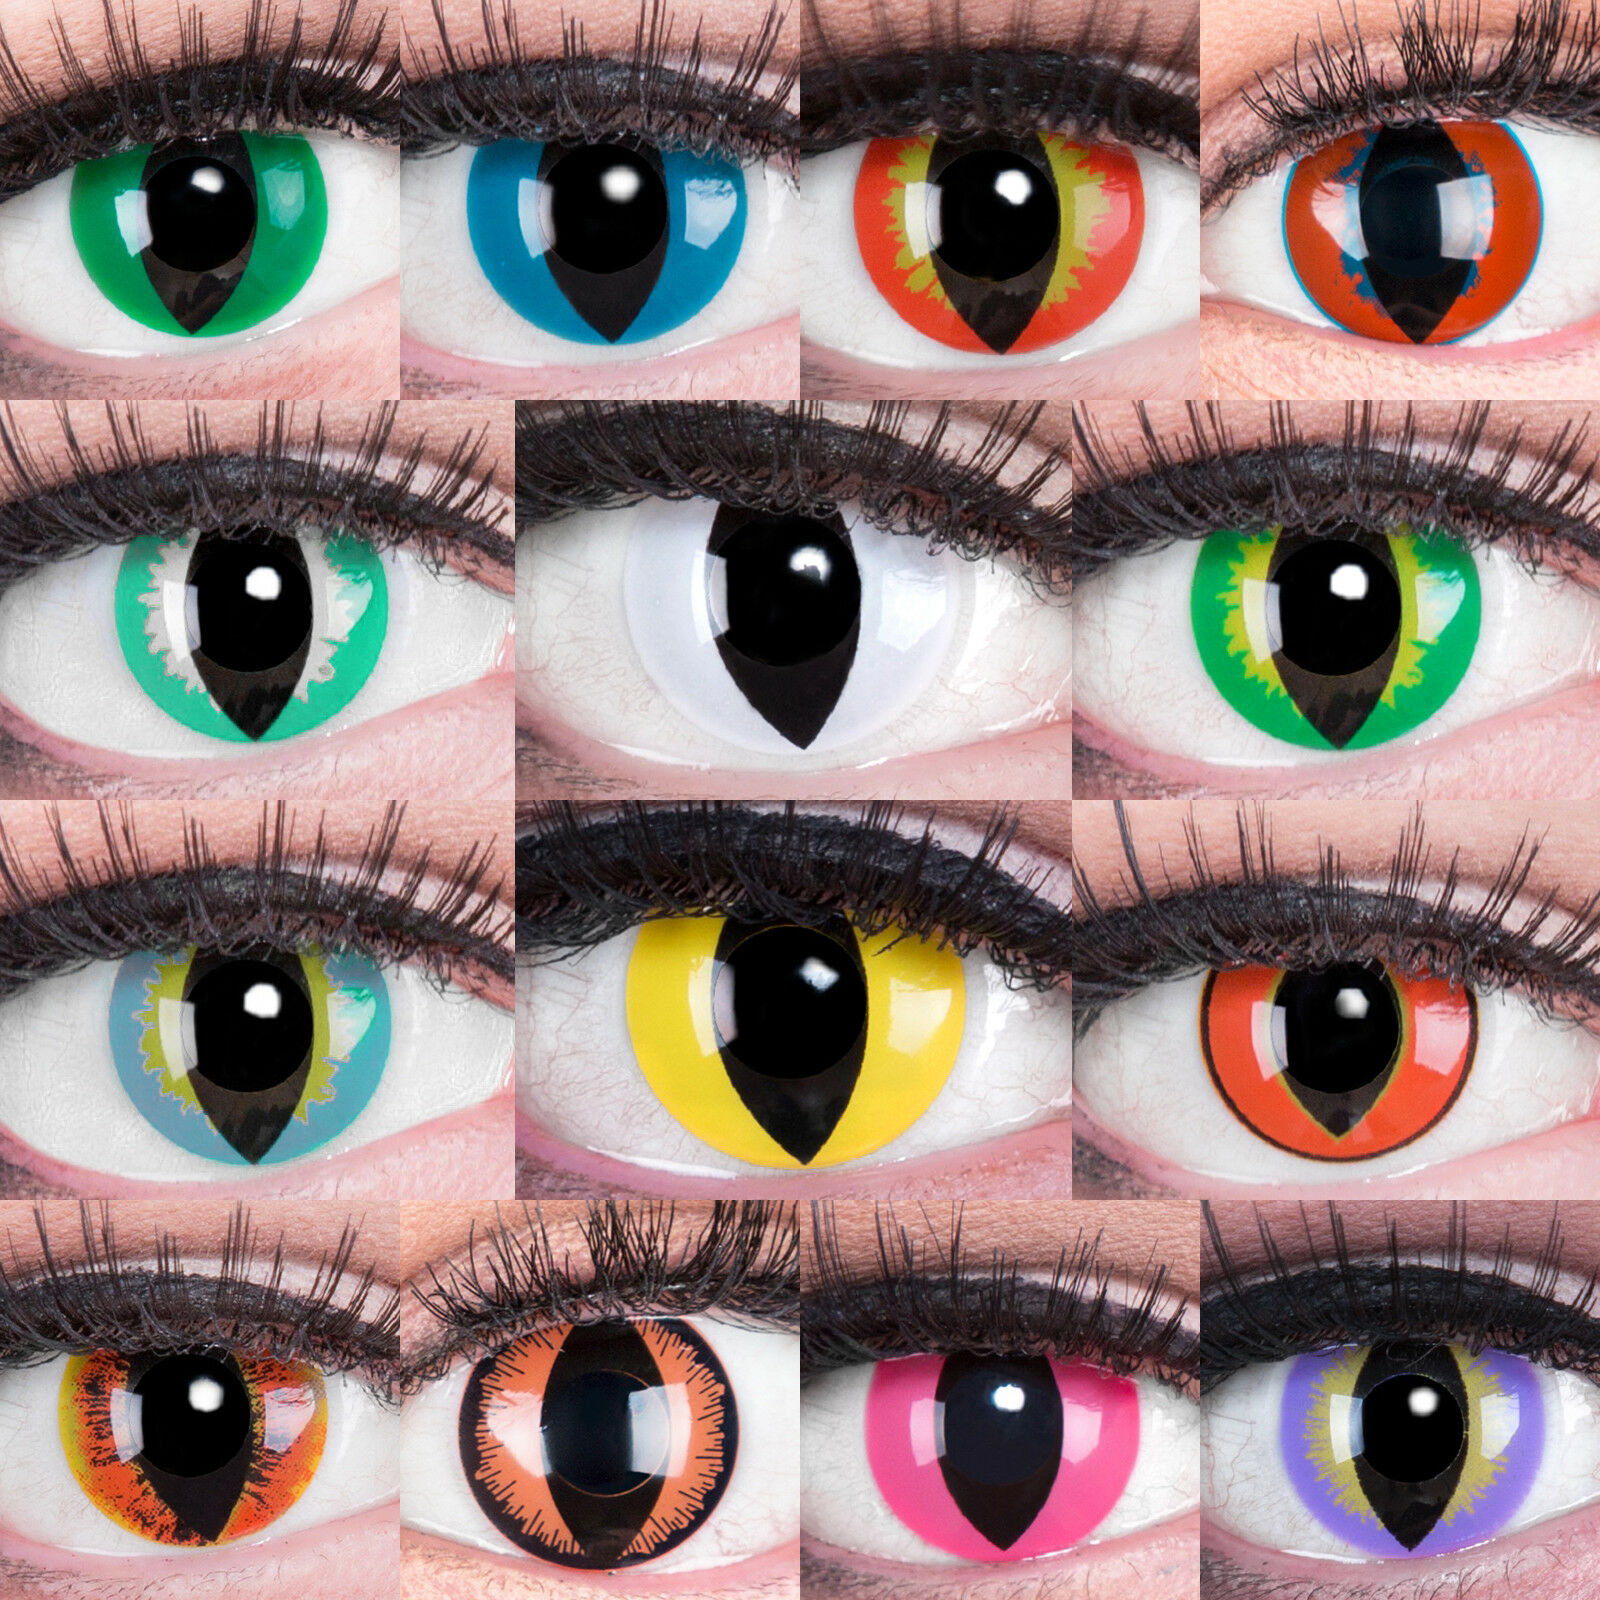 Farbige Kontaktlinsen ohne Stärke Halloween Fasching Karneval Cosplay + Behälter